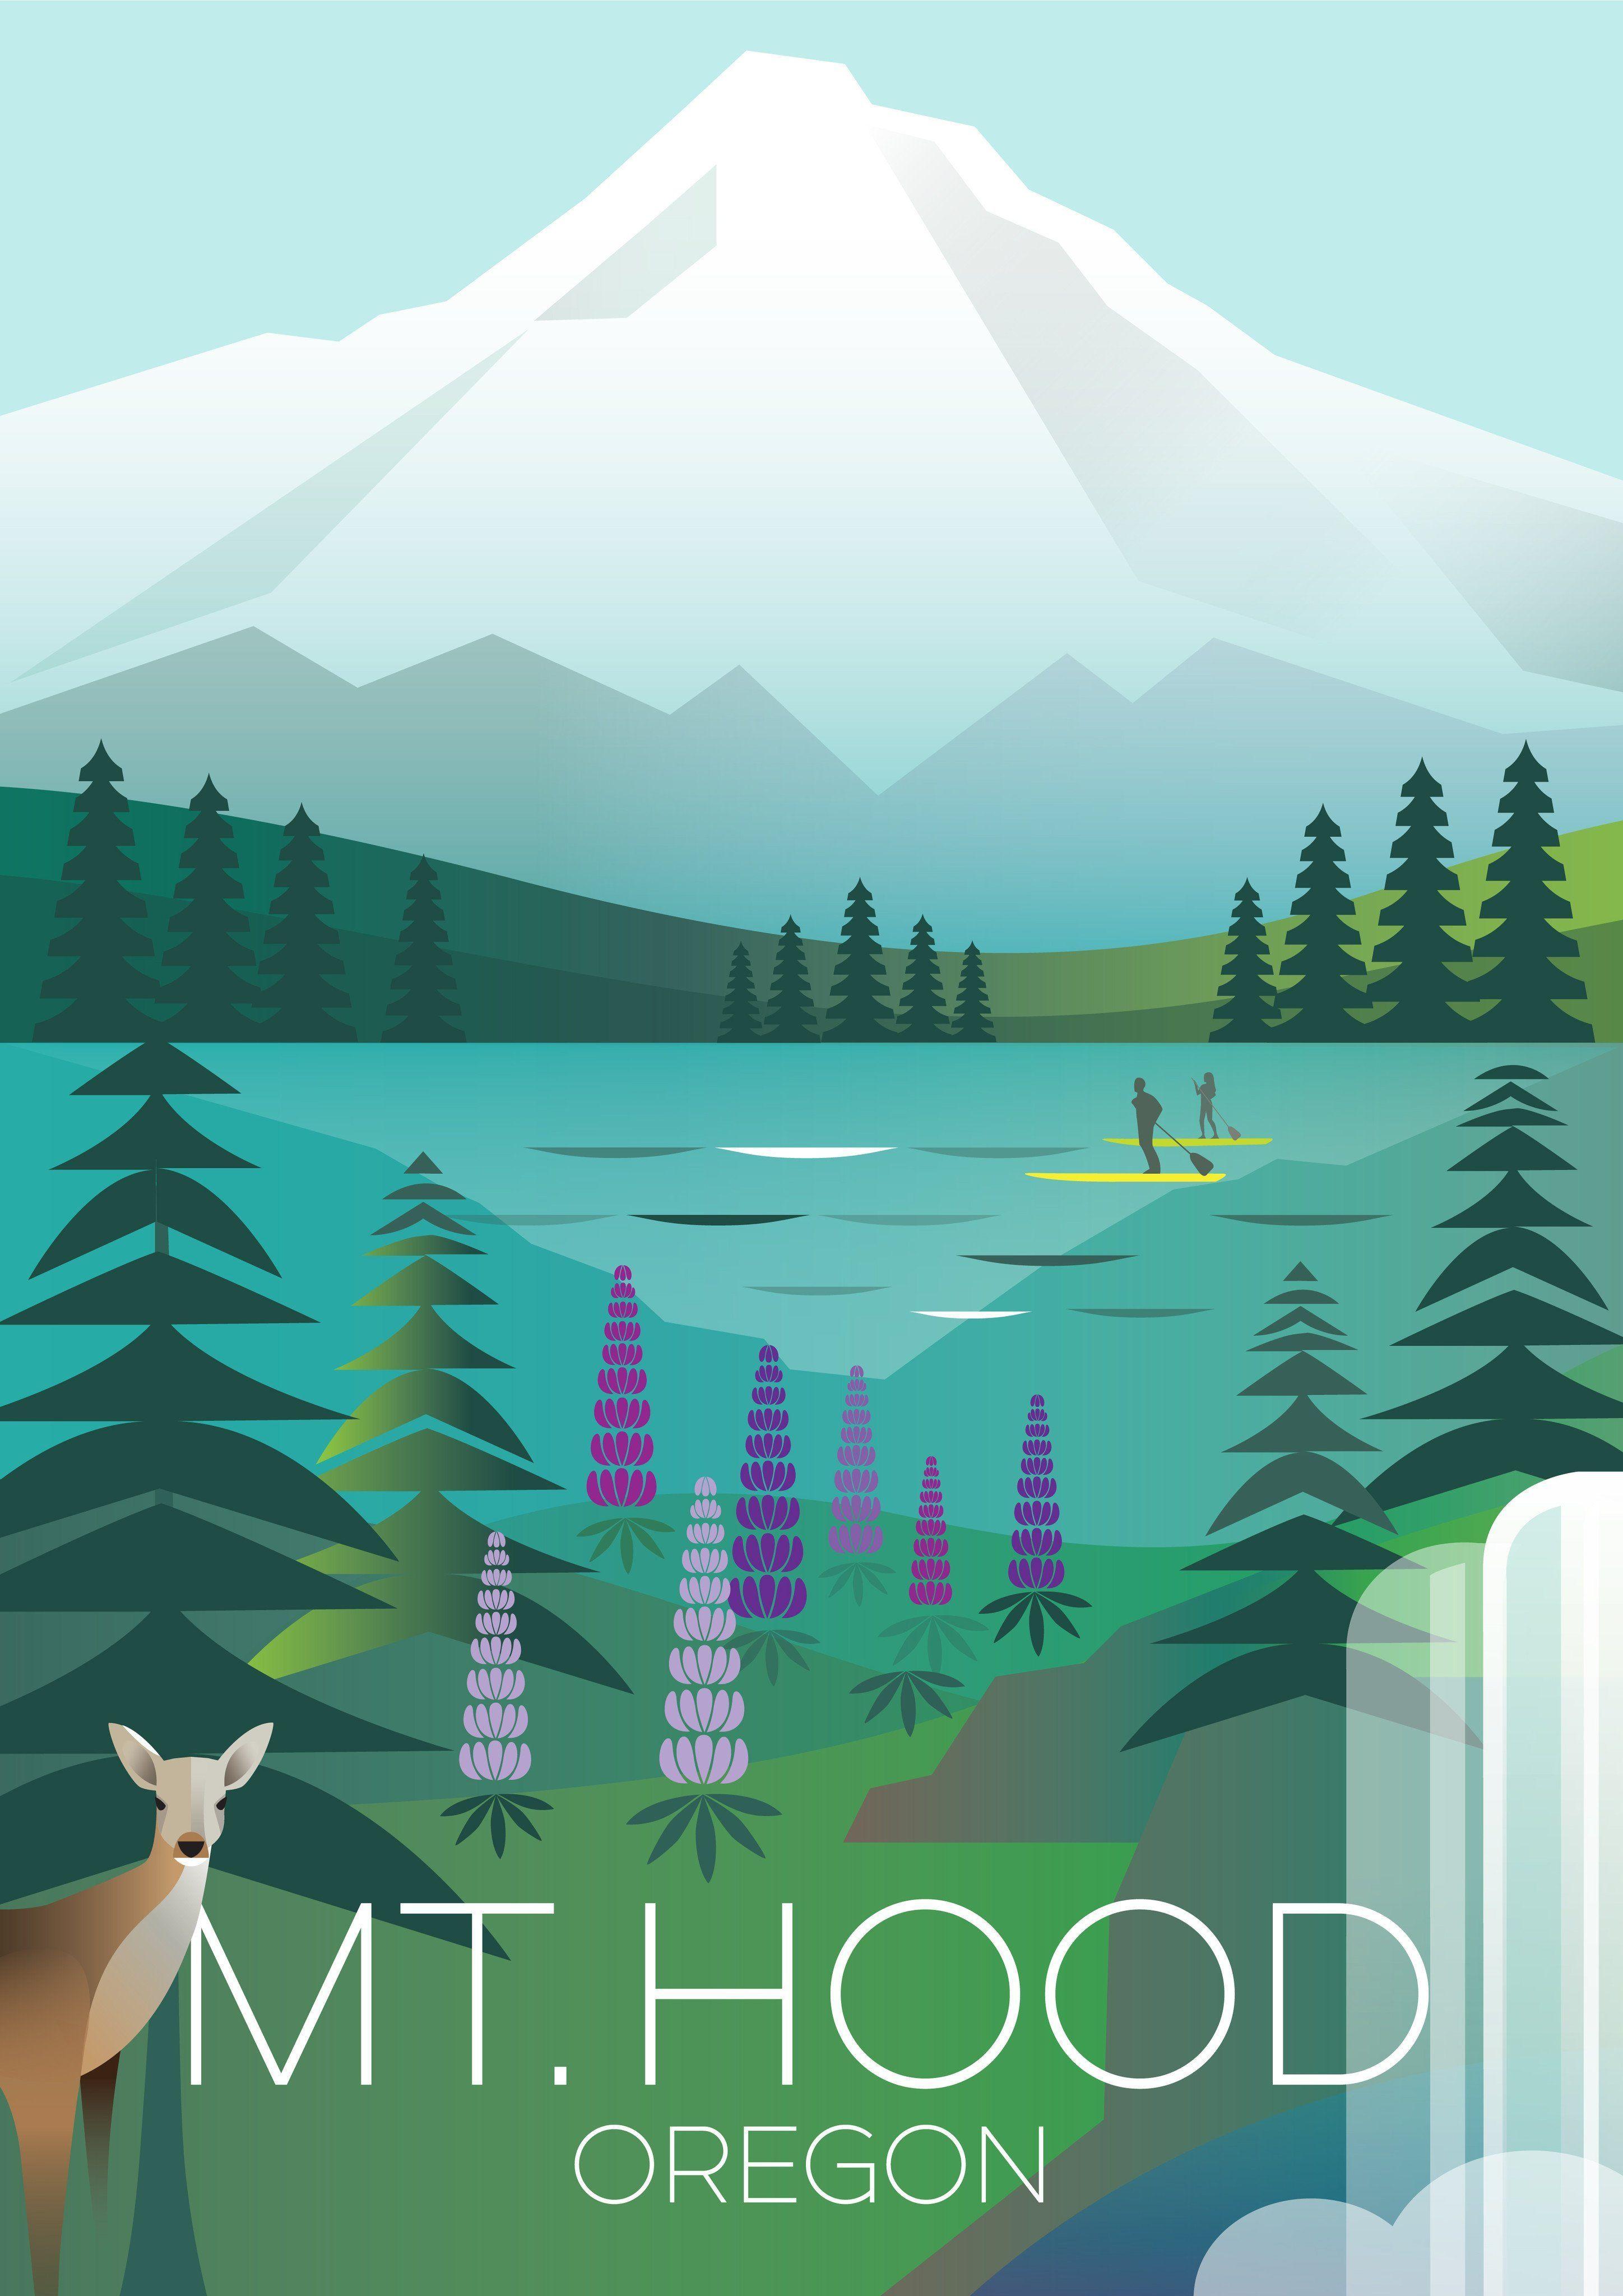 Mount Hood Print Travel Posters Vintage Travel Posters Vintage Posters